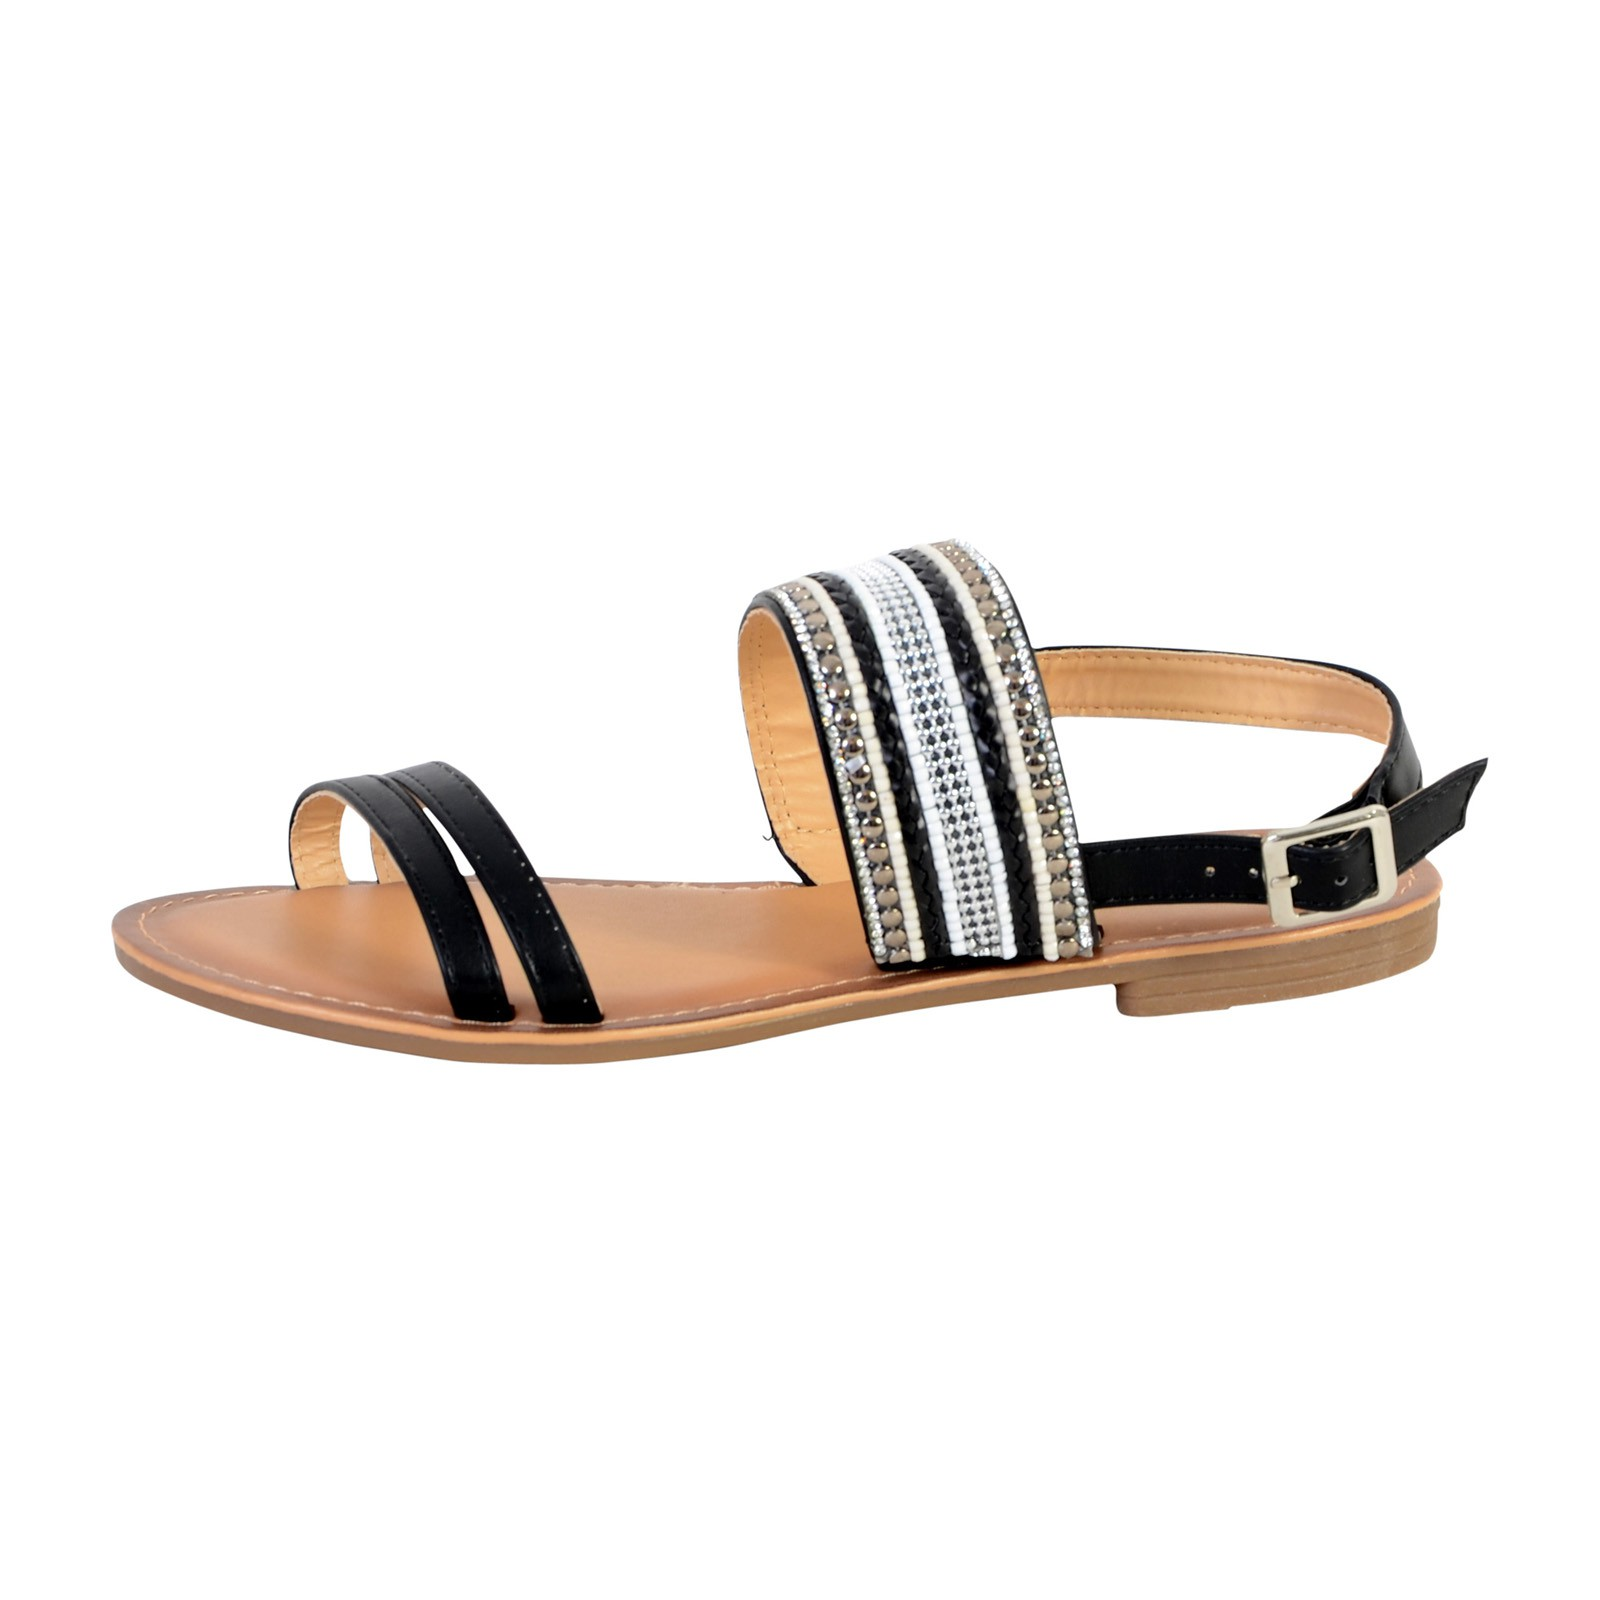 Nucci Plate Galerie Sandale Enza Chic zqVpGSUM